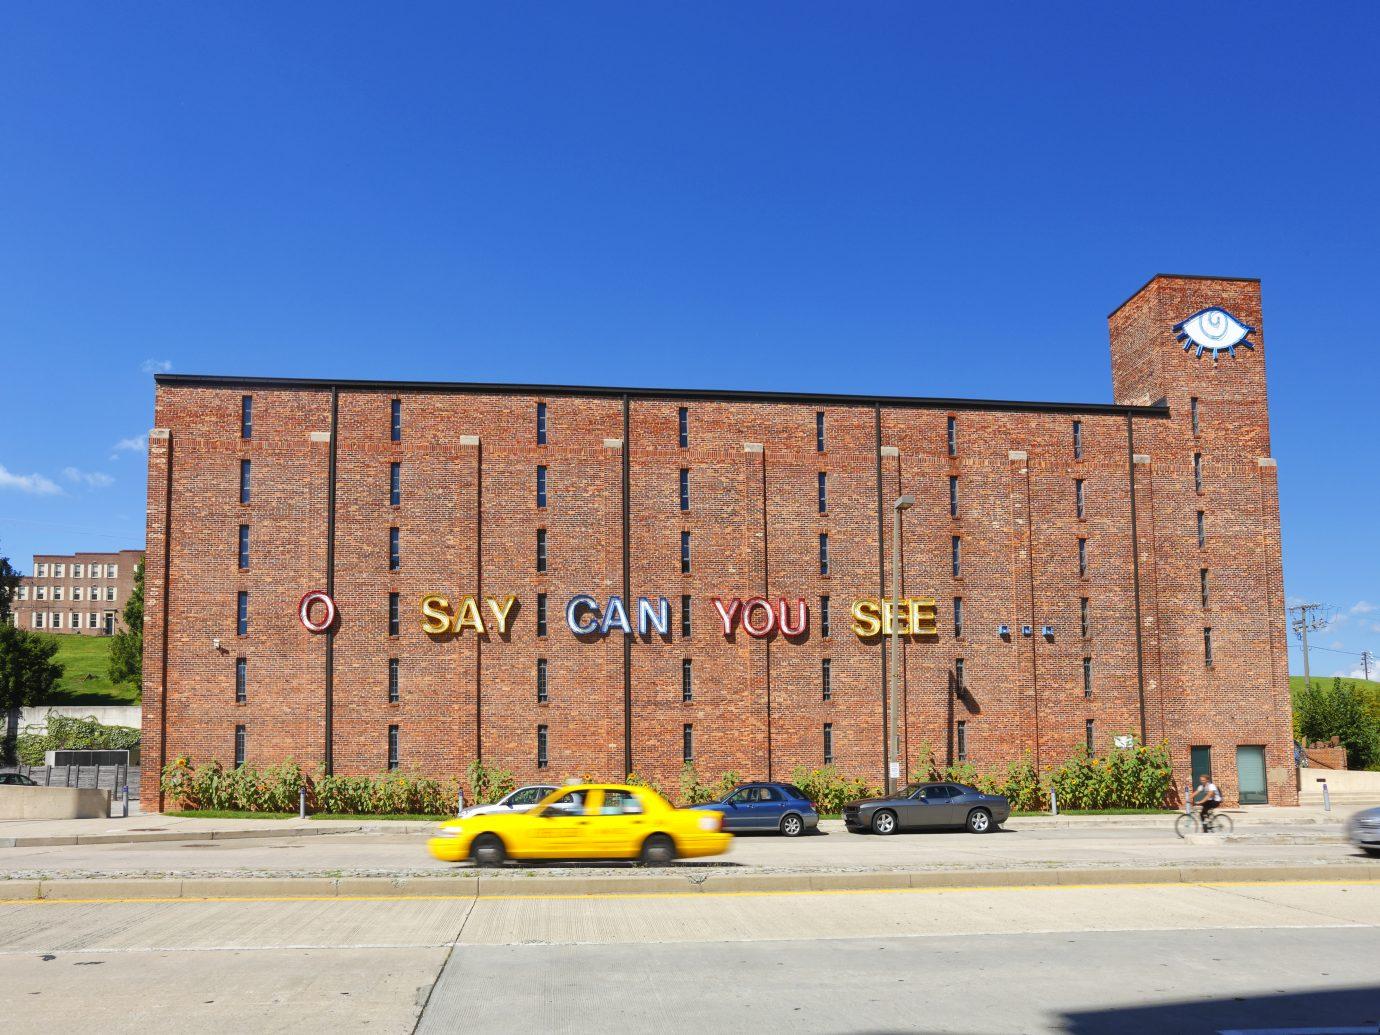 The American Visionary Art Museum in Baltimore